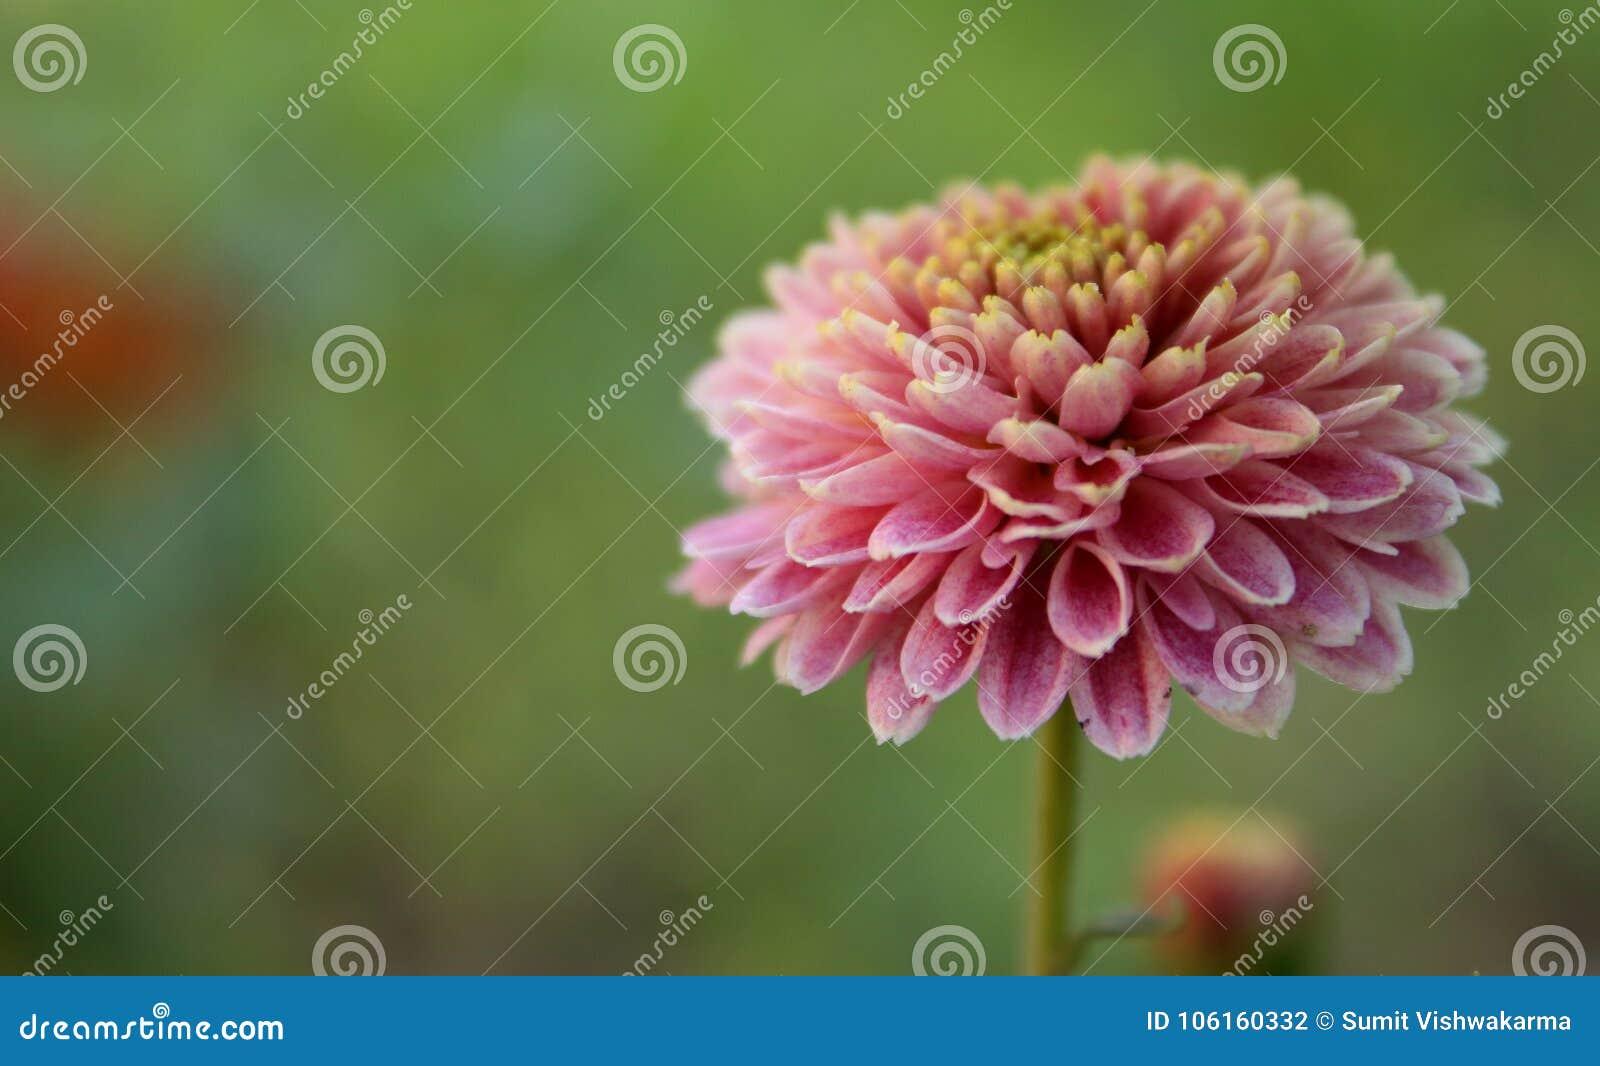 Beautiful pink flower with bkured background stock photo image of beautiful pink flower with bkured background izmirmasajfo